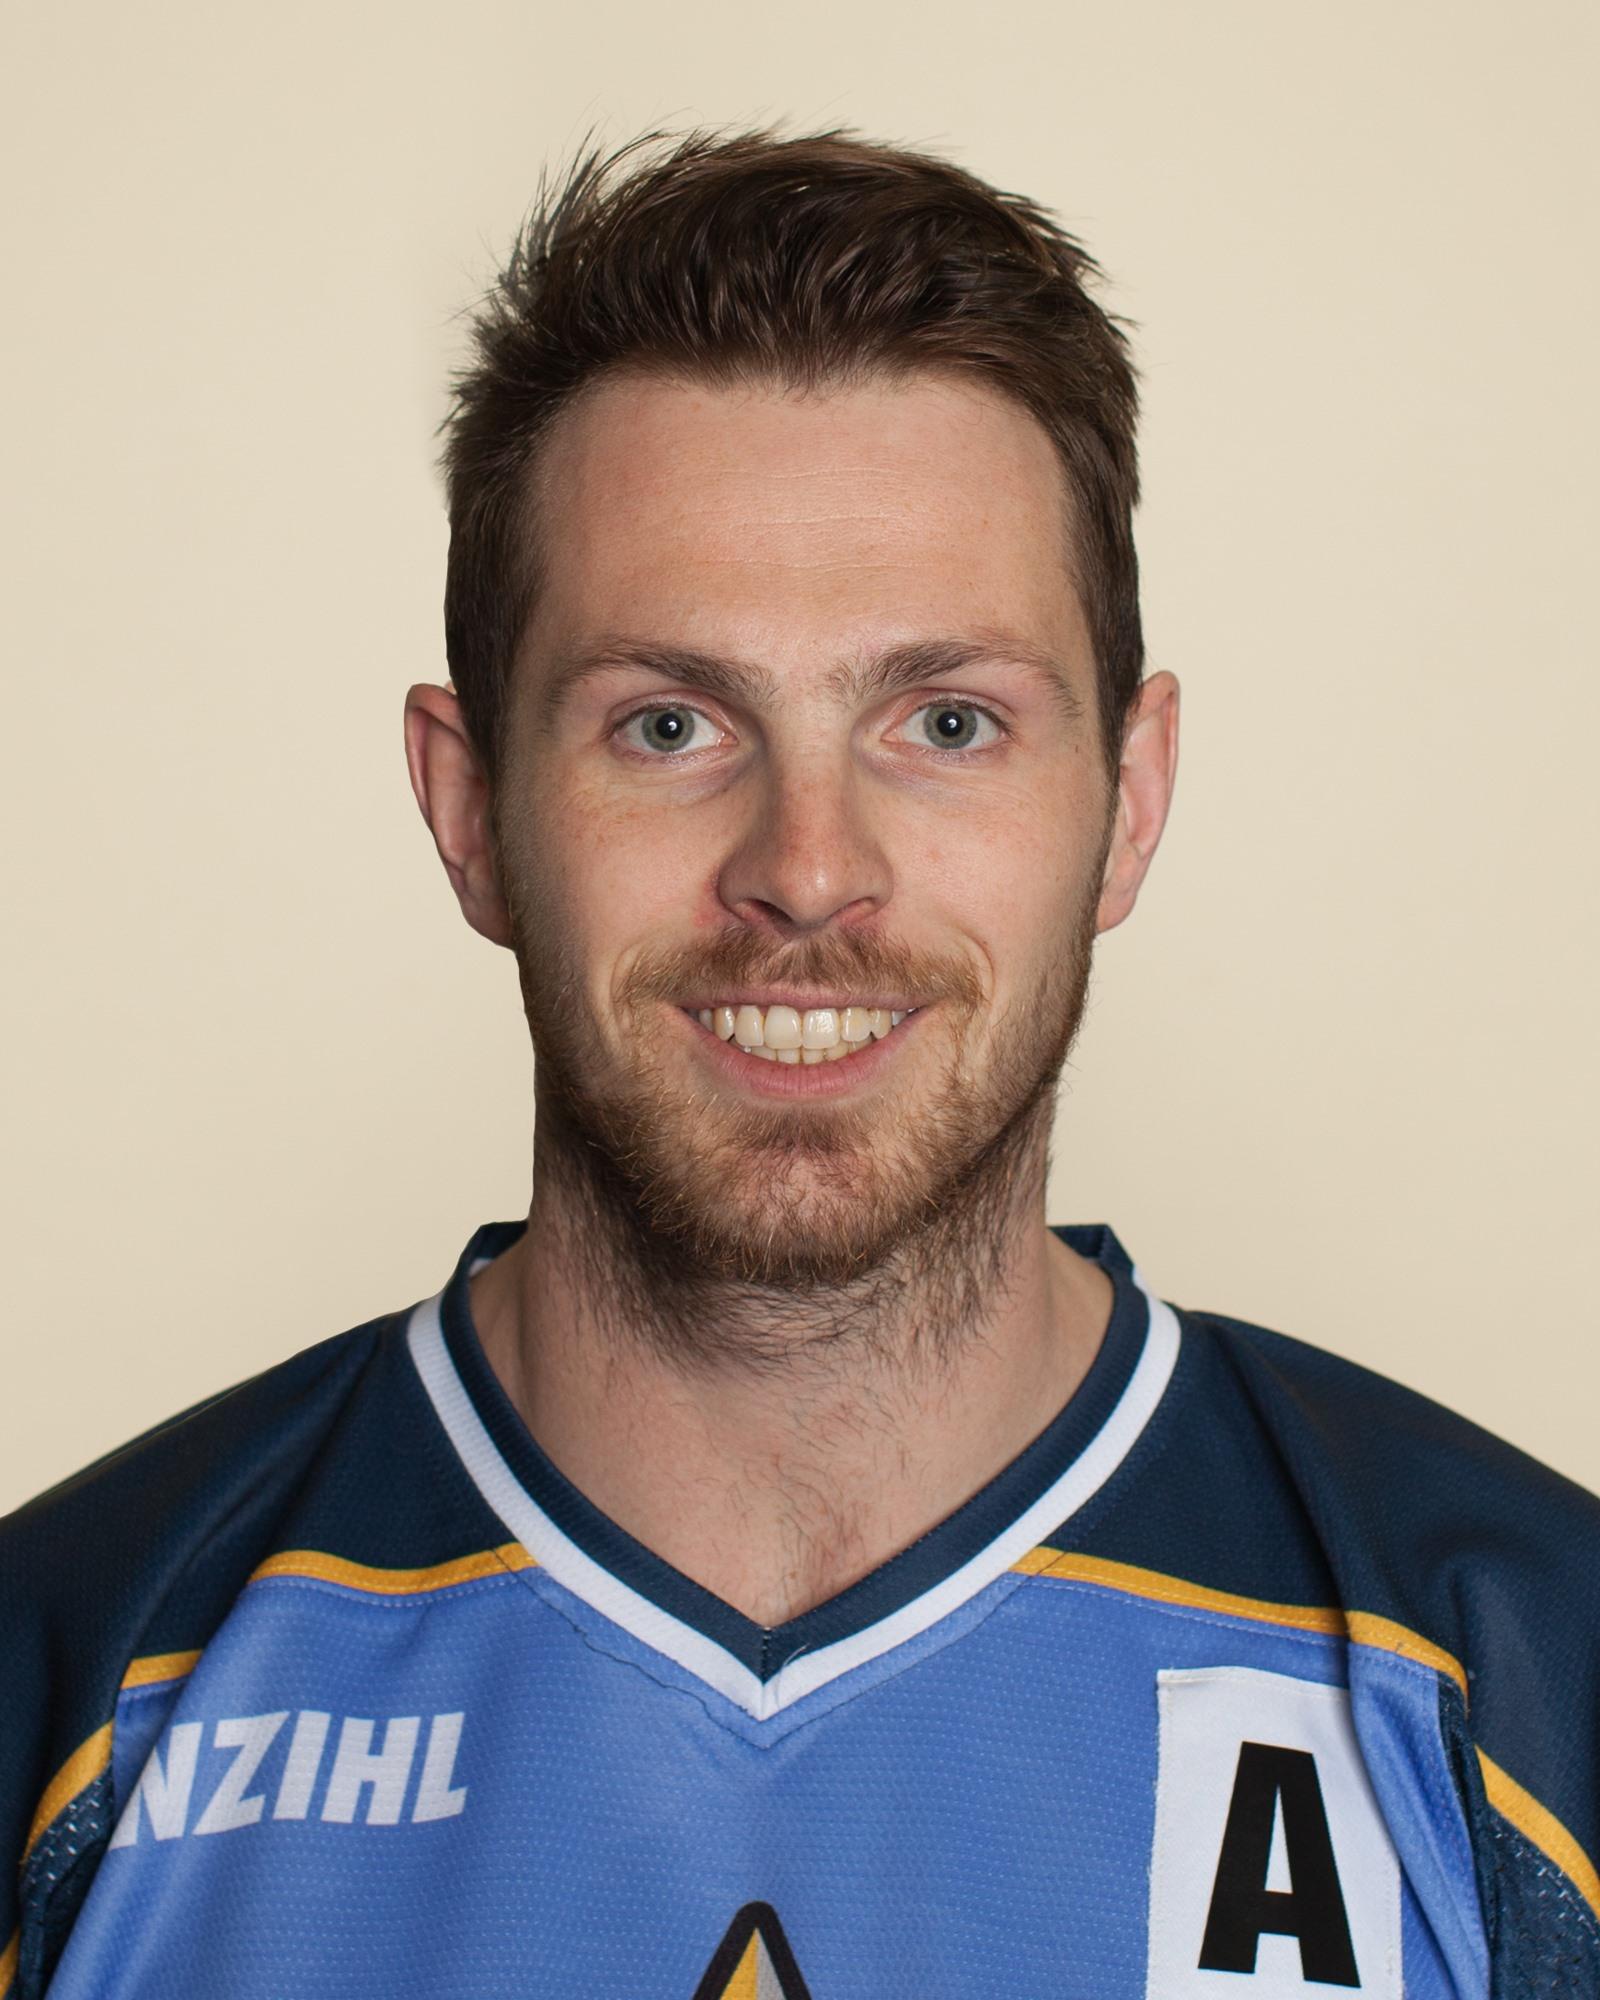 Nick Craig (A)